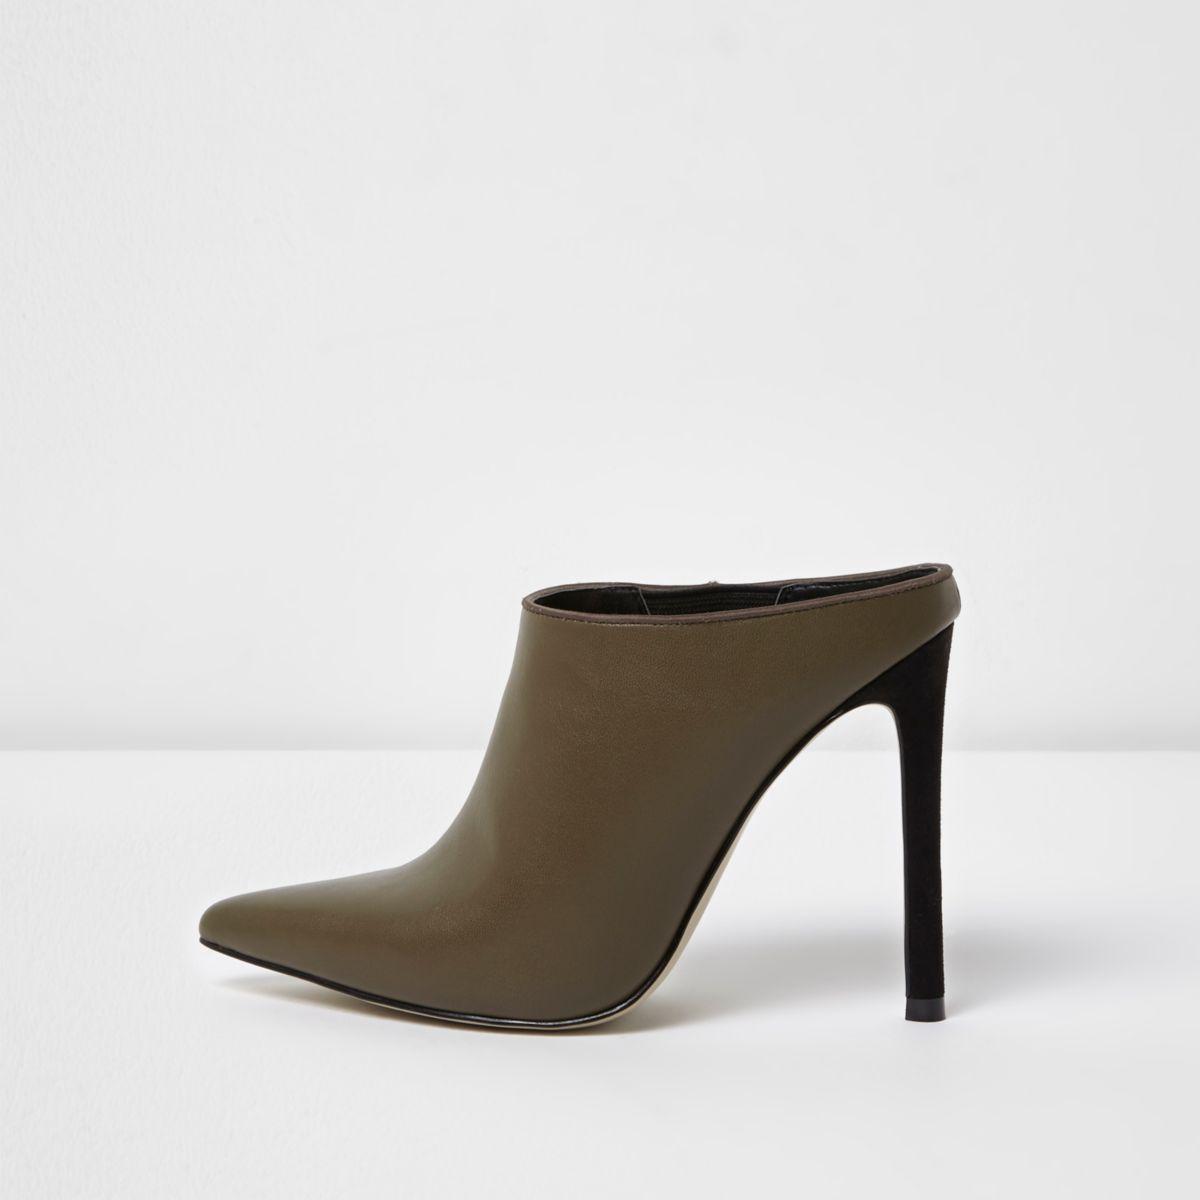 Khaki green pointed toe heeled mules